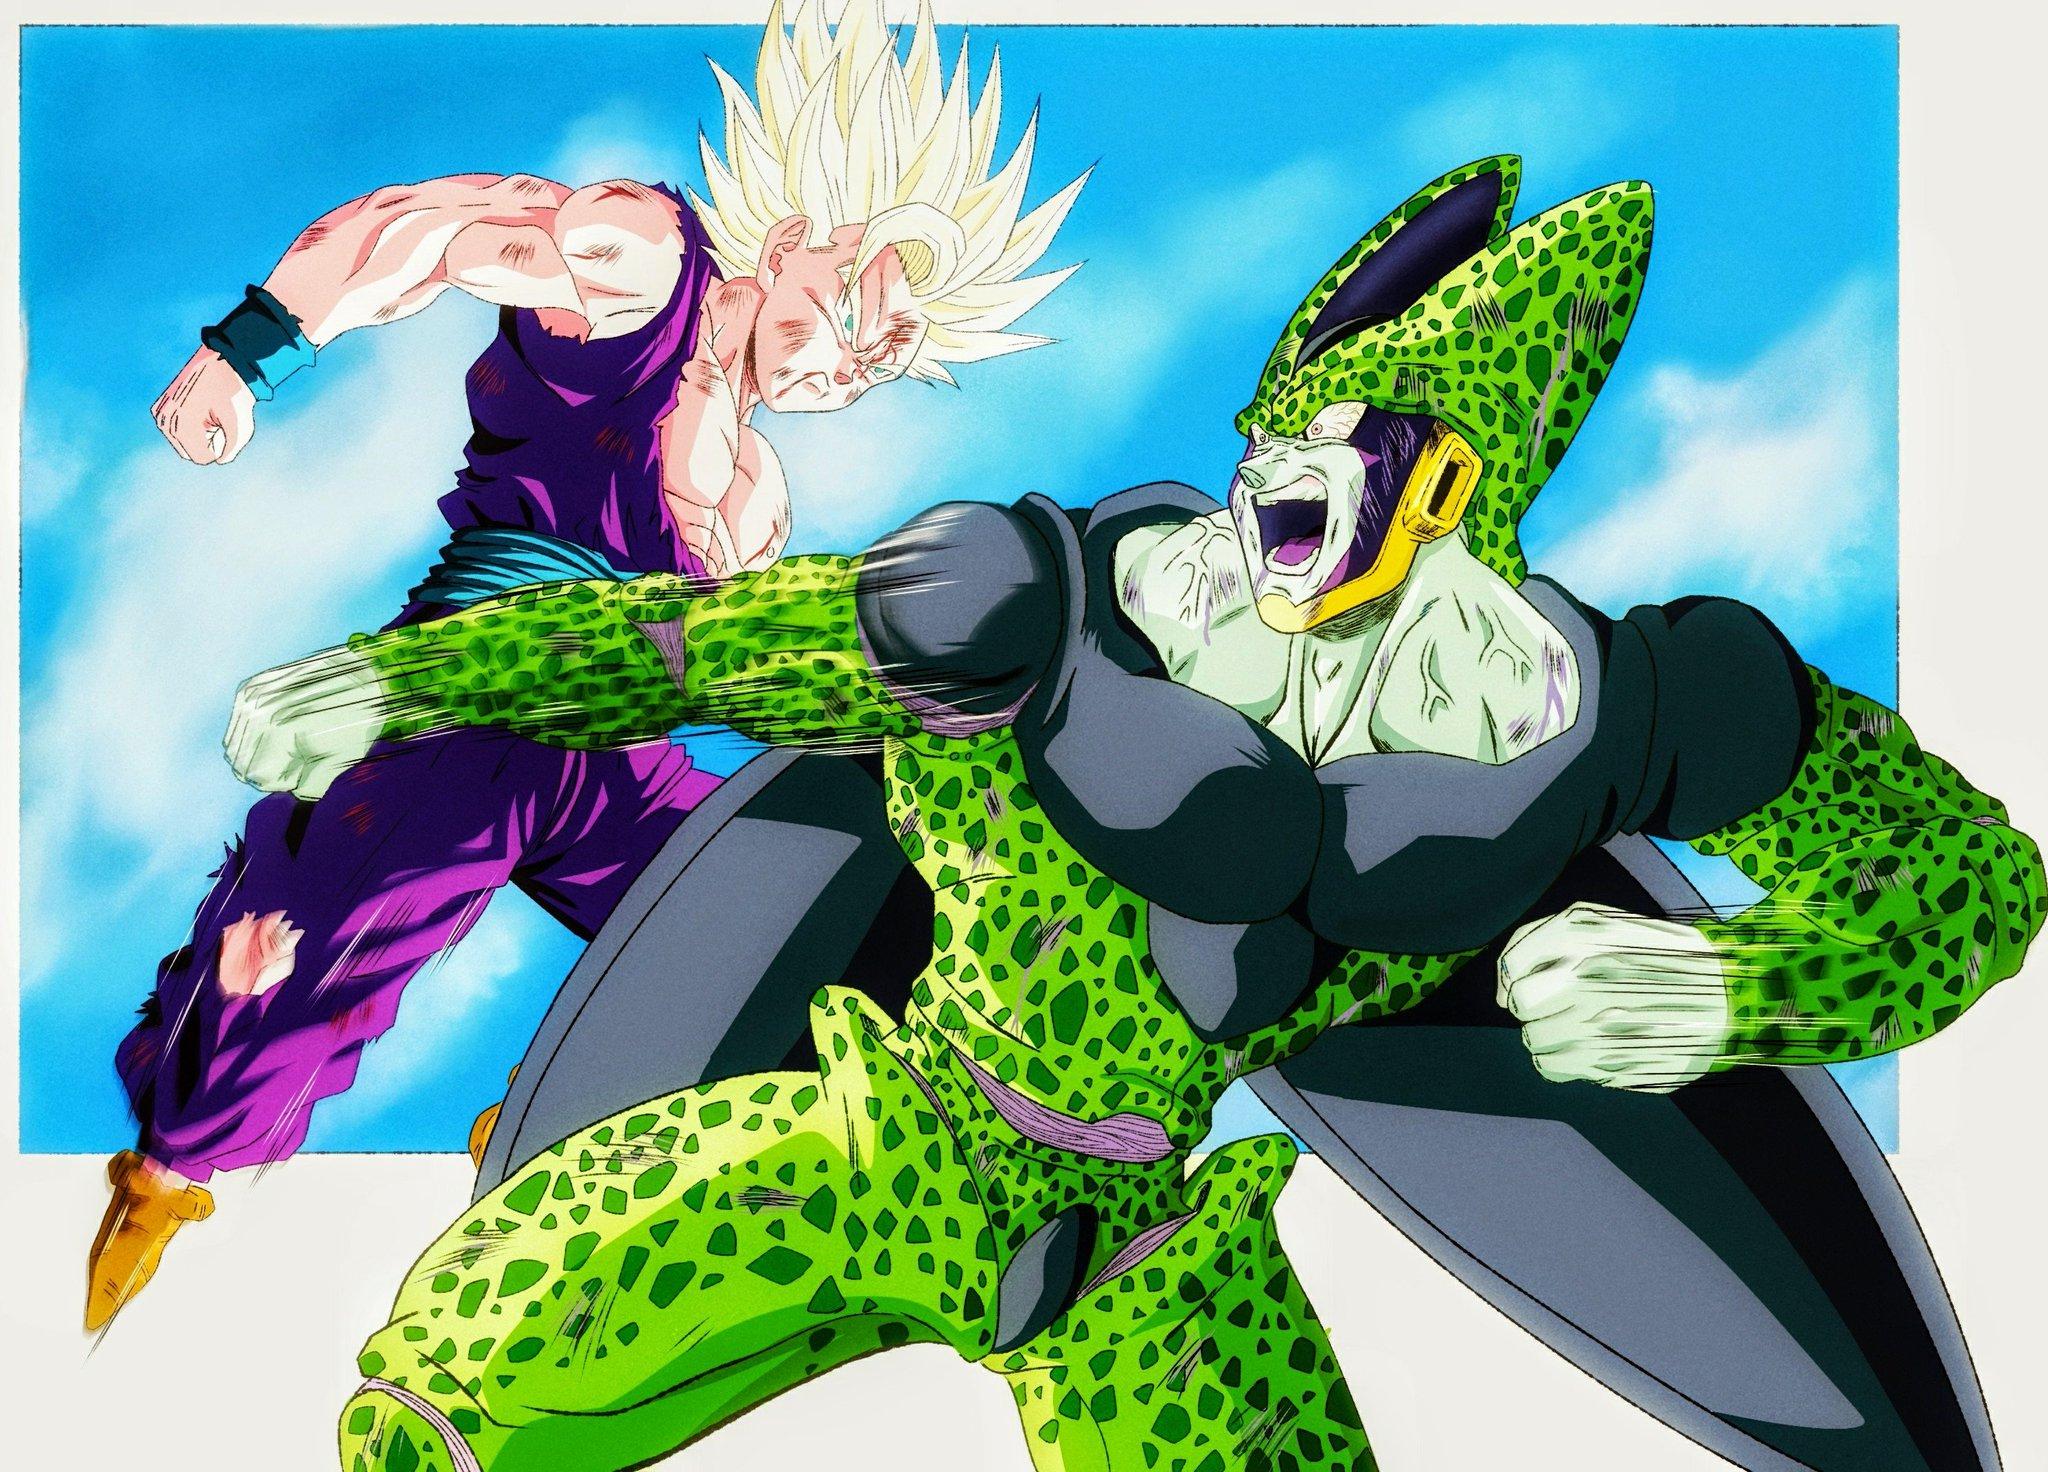 Franccast Draws Commission Open On Twitter Dibujo Terminado Gohan Vs Cell Fan Art Adaptación Genga Franciscocn1995 Lineart Y Color Nicolasrivas920 Dragonballsuper Dragonball Dragonballz Goku Artist Art Artworks Dbz Dbsuper